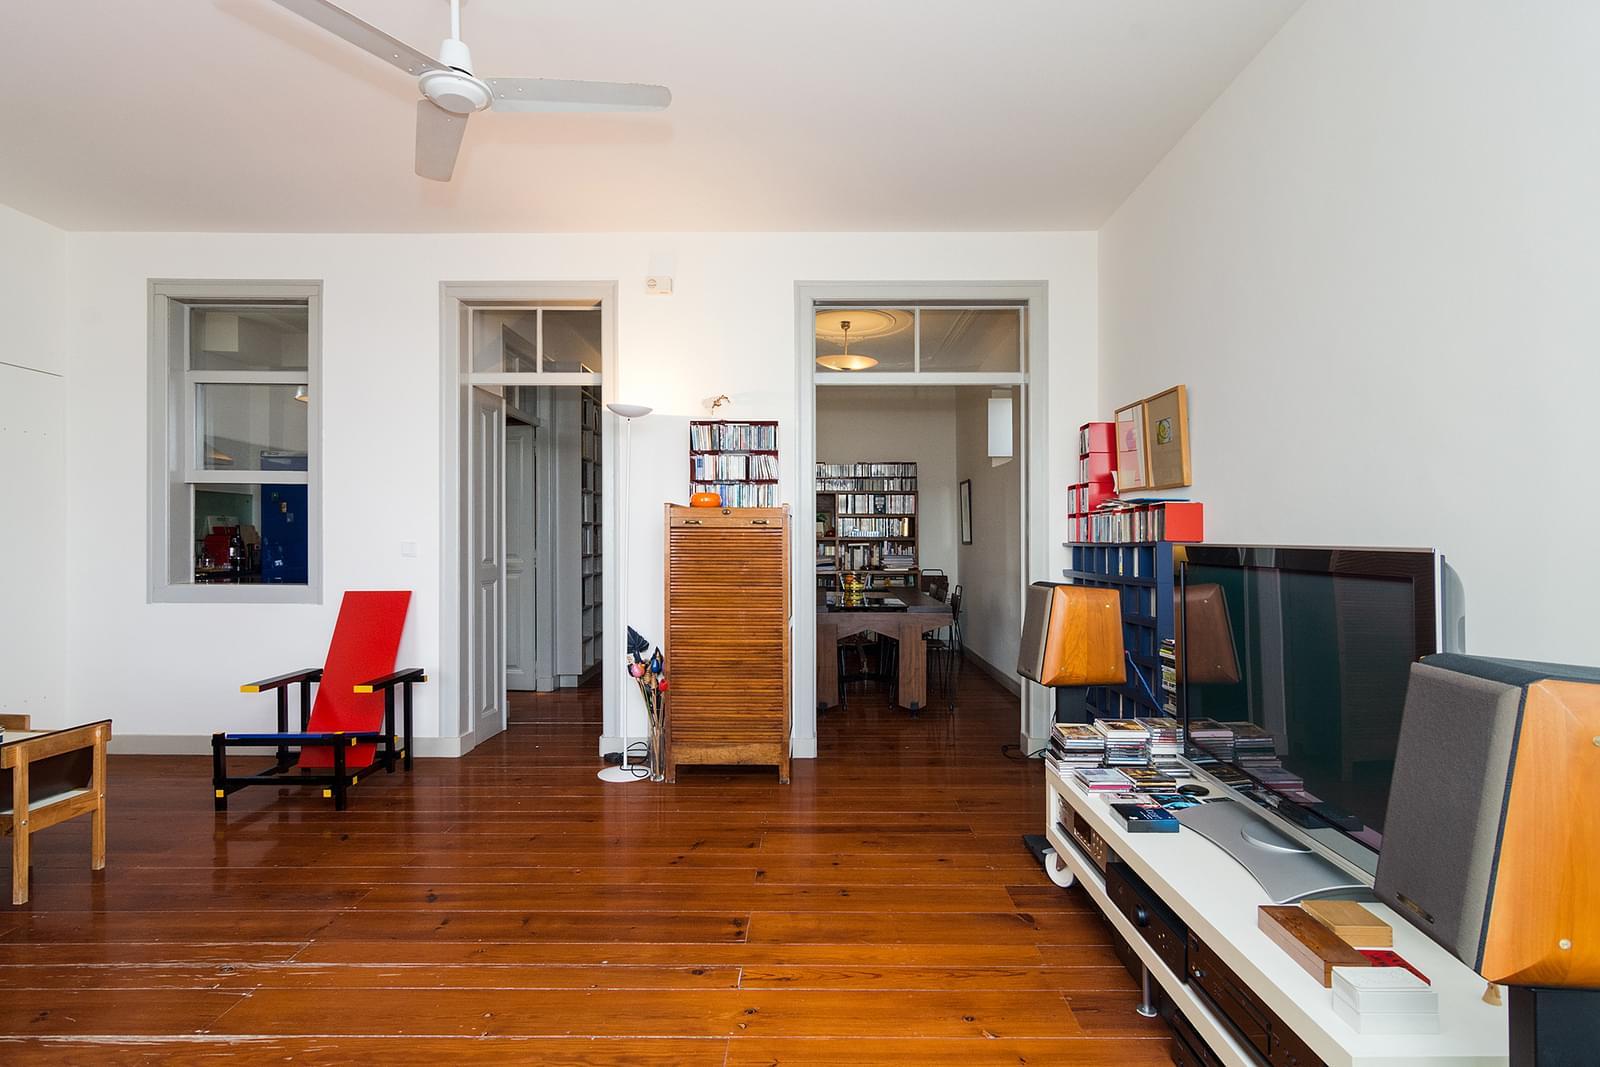 pf17052-apartamento-t3-lisboa-5a1fd673-9ae0-4171-9d18-0a9be0231648